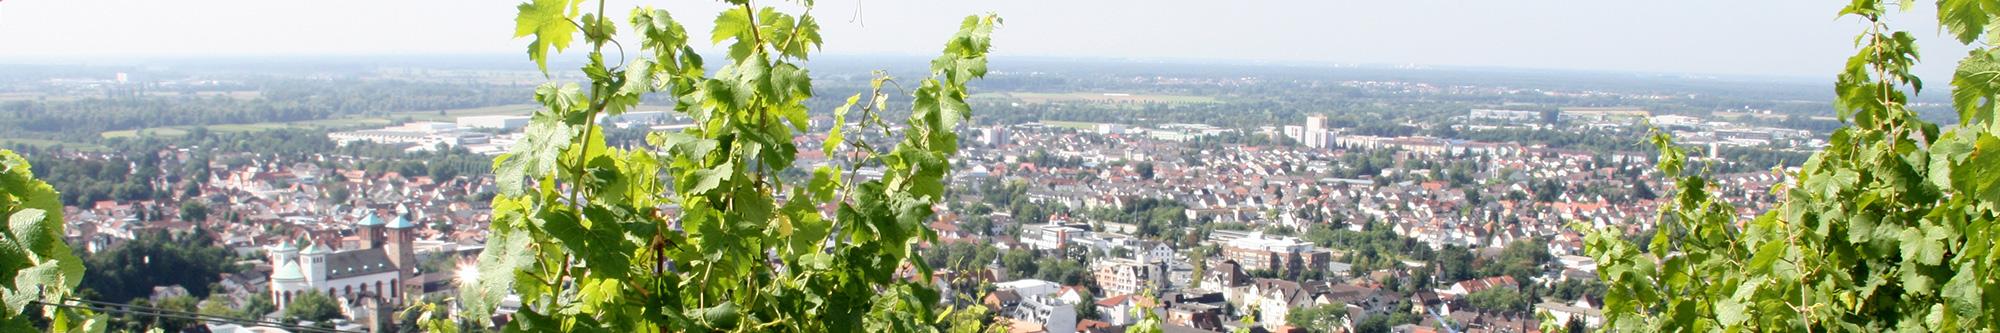 Überblick Bensheim